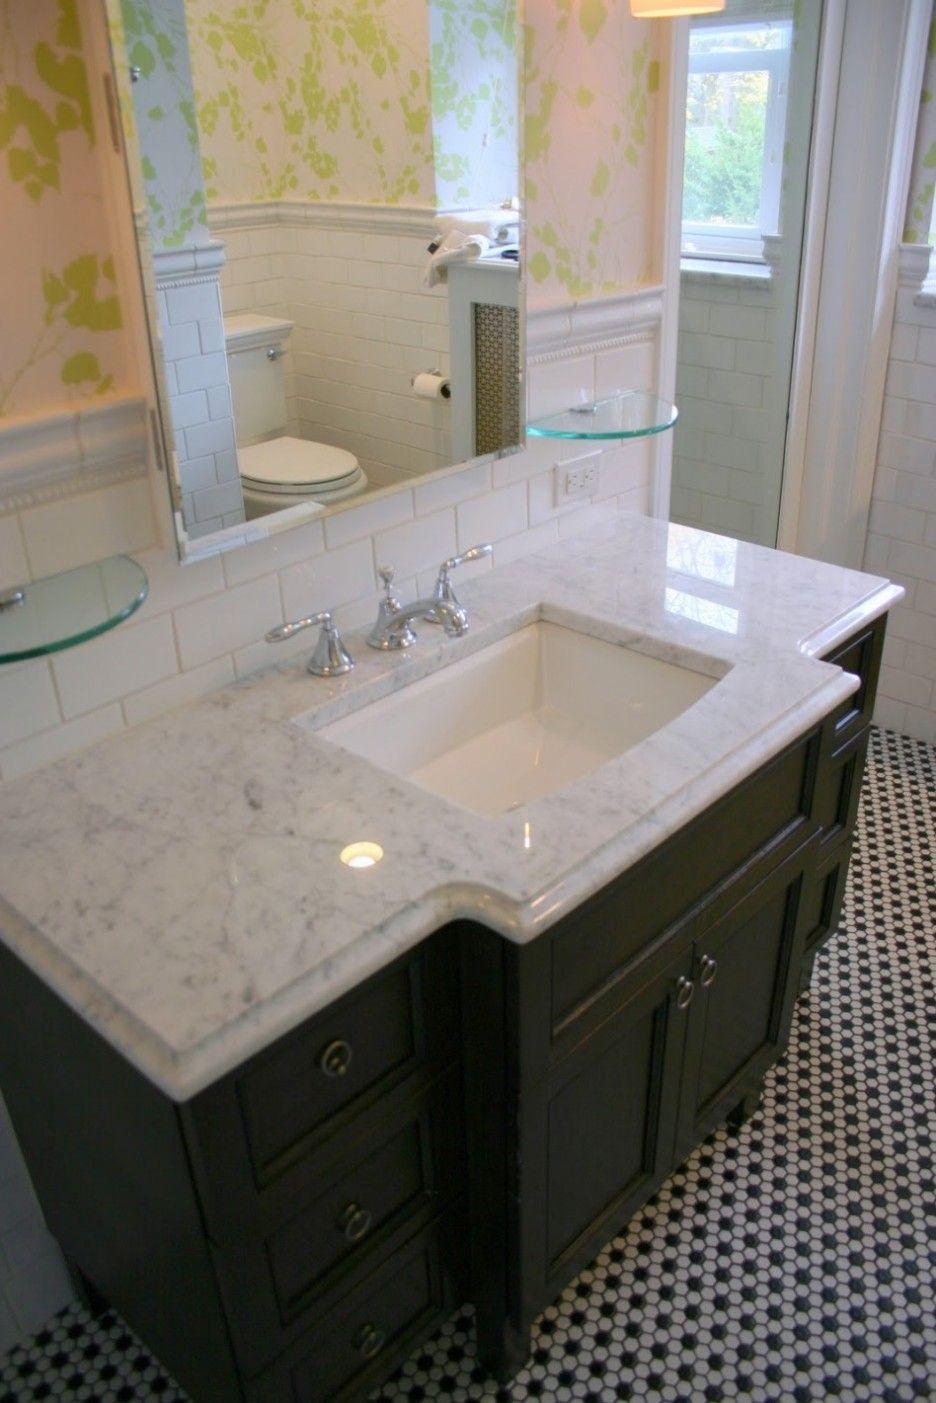 bath in vanities countertops w the depot winter top mist single collection tops stone n decorators bathroom b effects basin wm home vanity